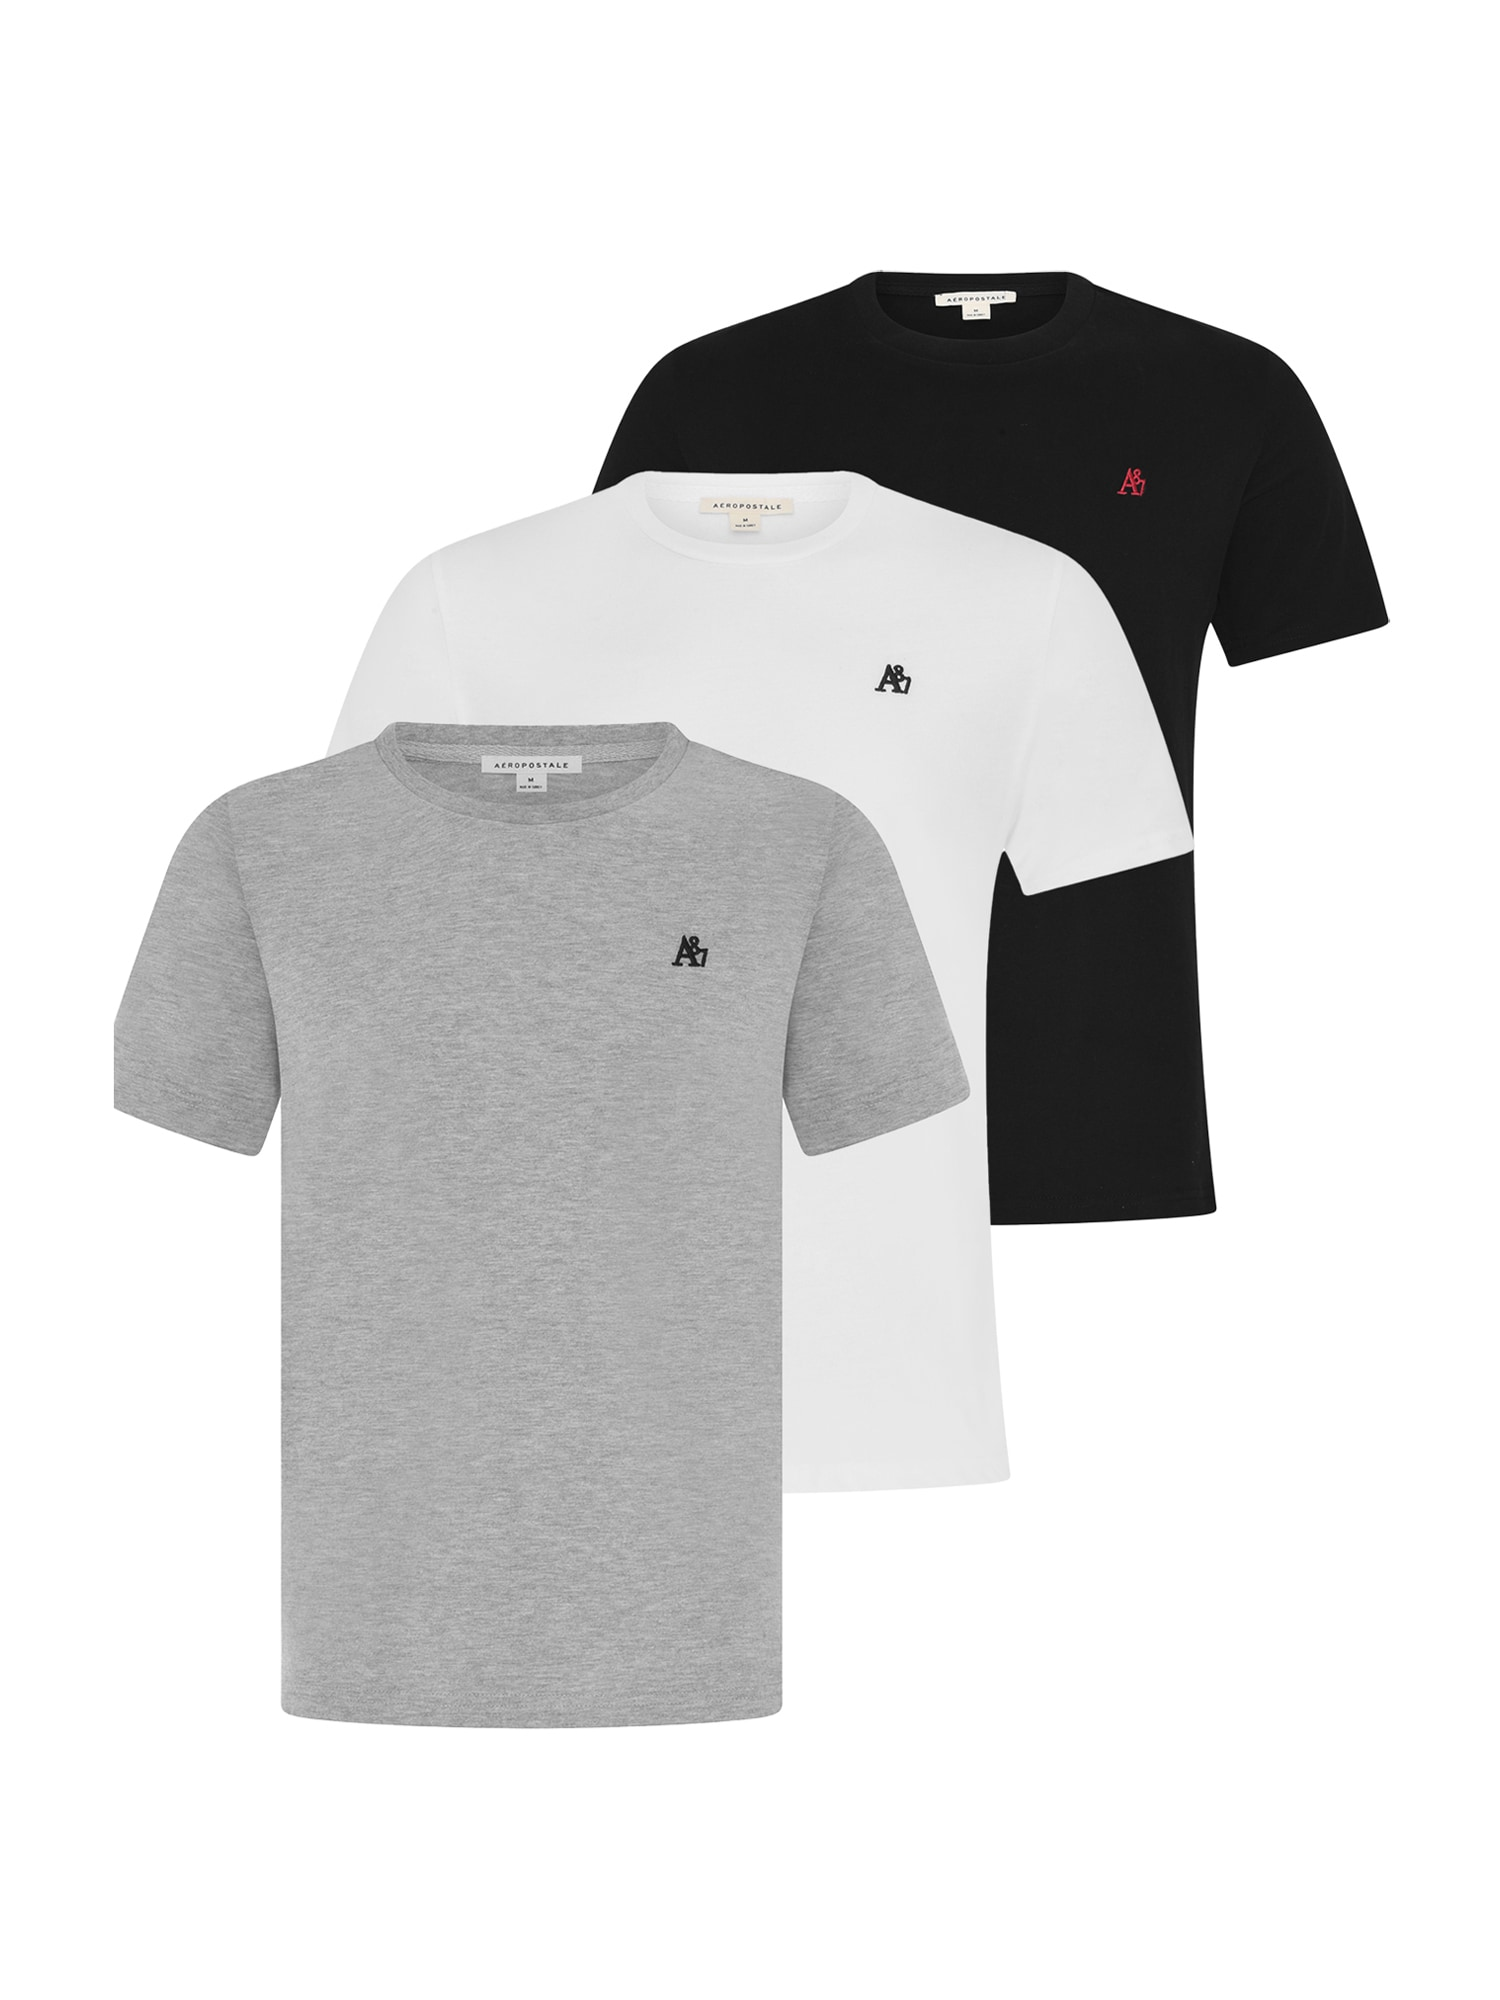 AÉROPOSTALE Marškinėliai juoda / balta / margai pilka